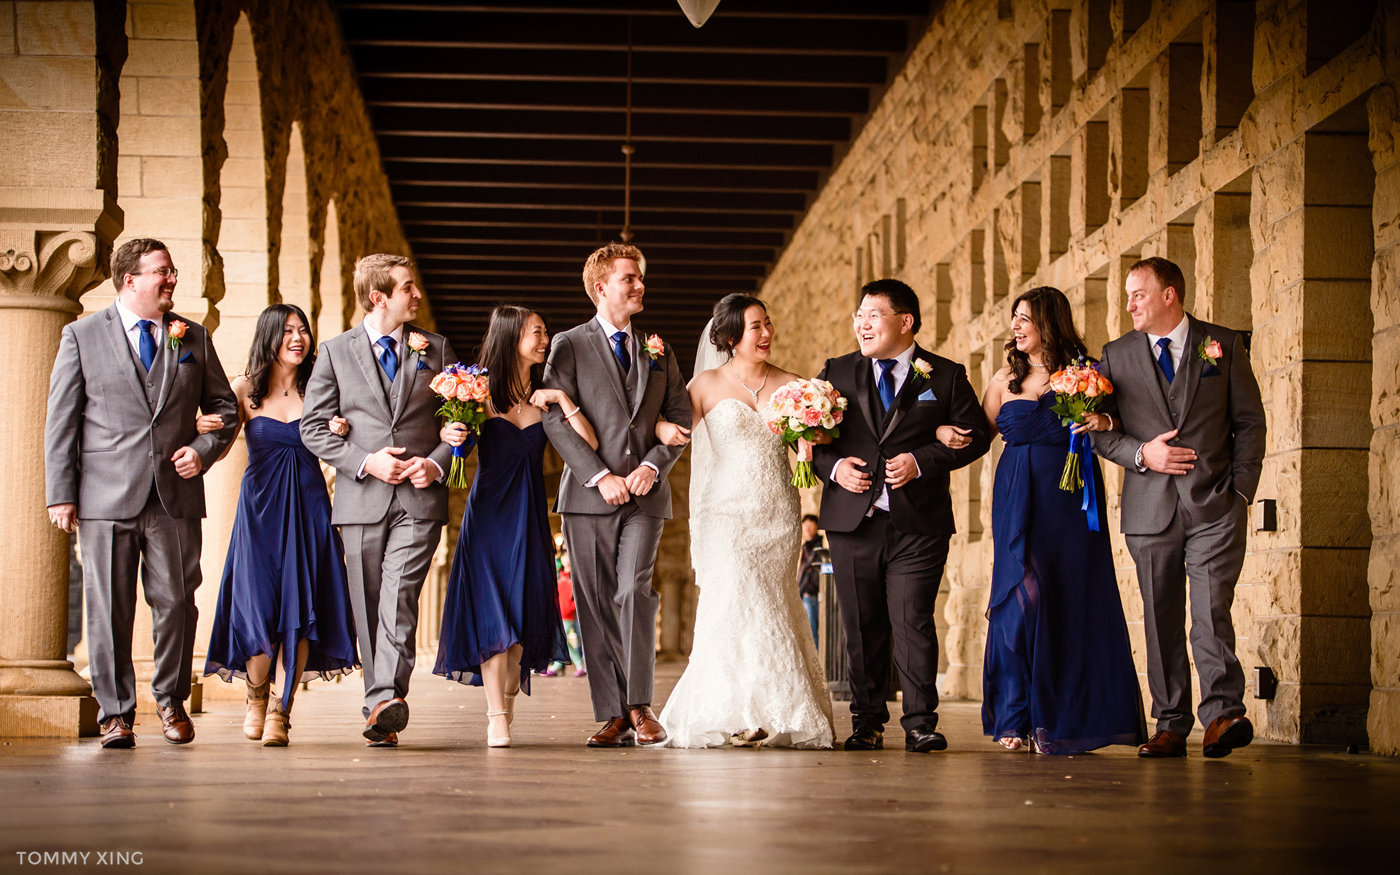 STANFORD MEMORIAL CHURCH WEDDING - Wenjie & Chengcheng - SAN FRANCISCO BAY AREA 斯坦福教堂婚礼跟拍 - 洛杉矶婚礼婚纱照摄影师 Tommy Xing Photography149.jpg